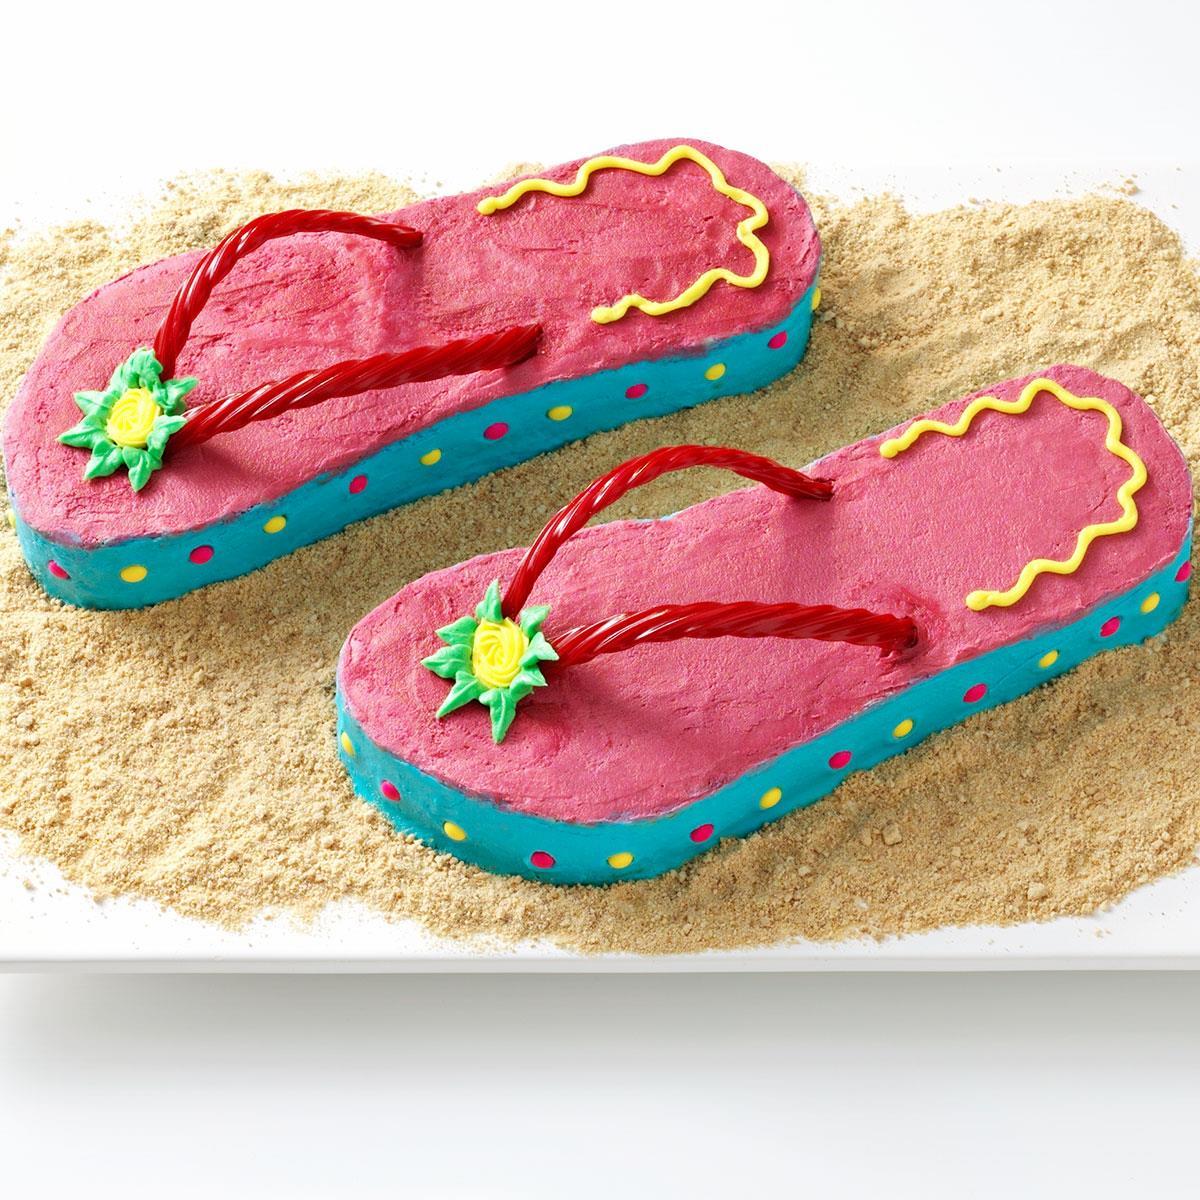 Incredible Flip Flop Cakes Recipe Taste Of Home Birthday Cards Printable Inklcafe Filternl